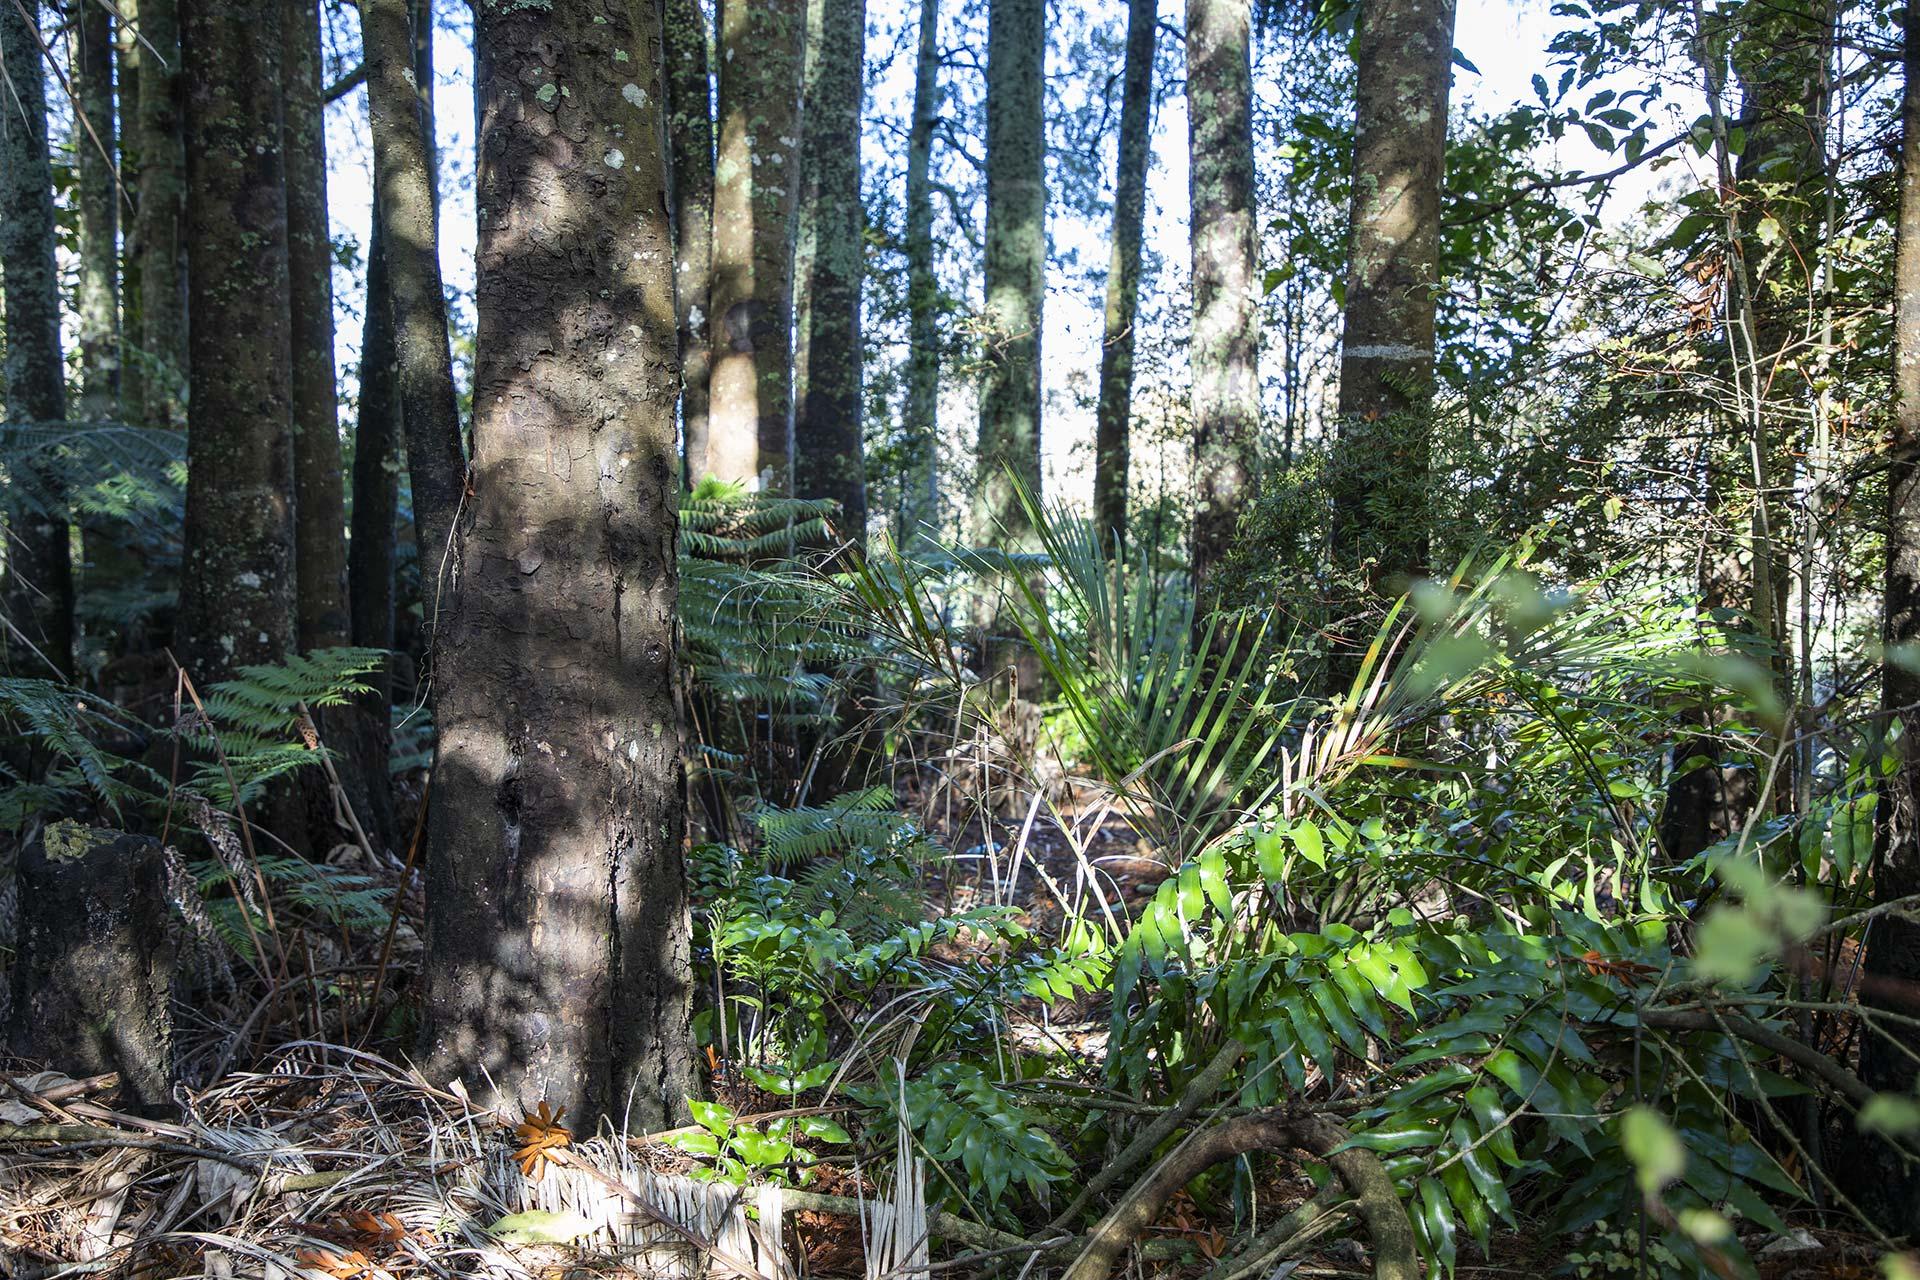 Inside the native bush at Ashmole Farm